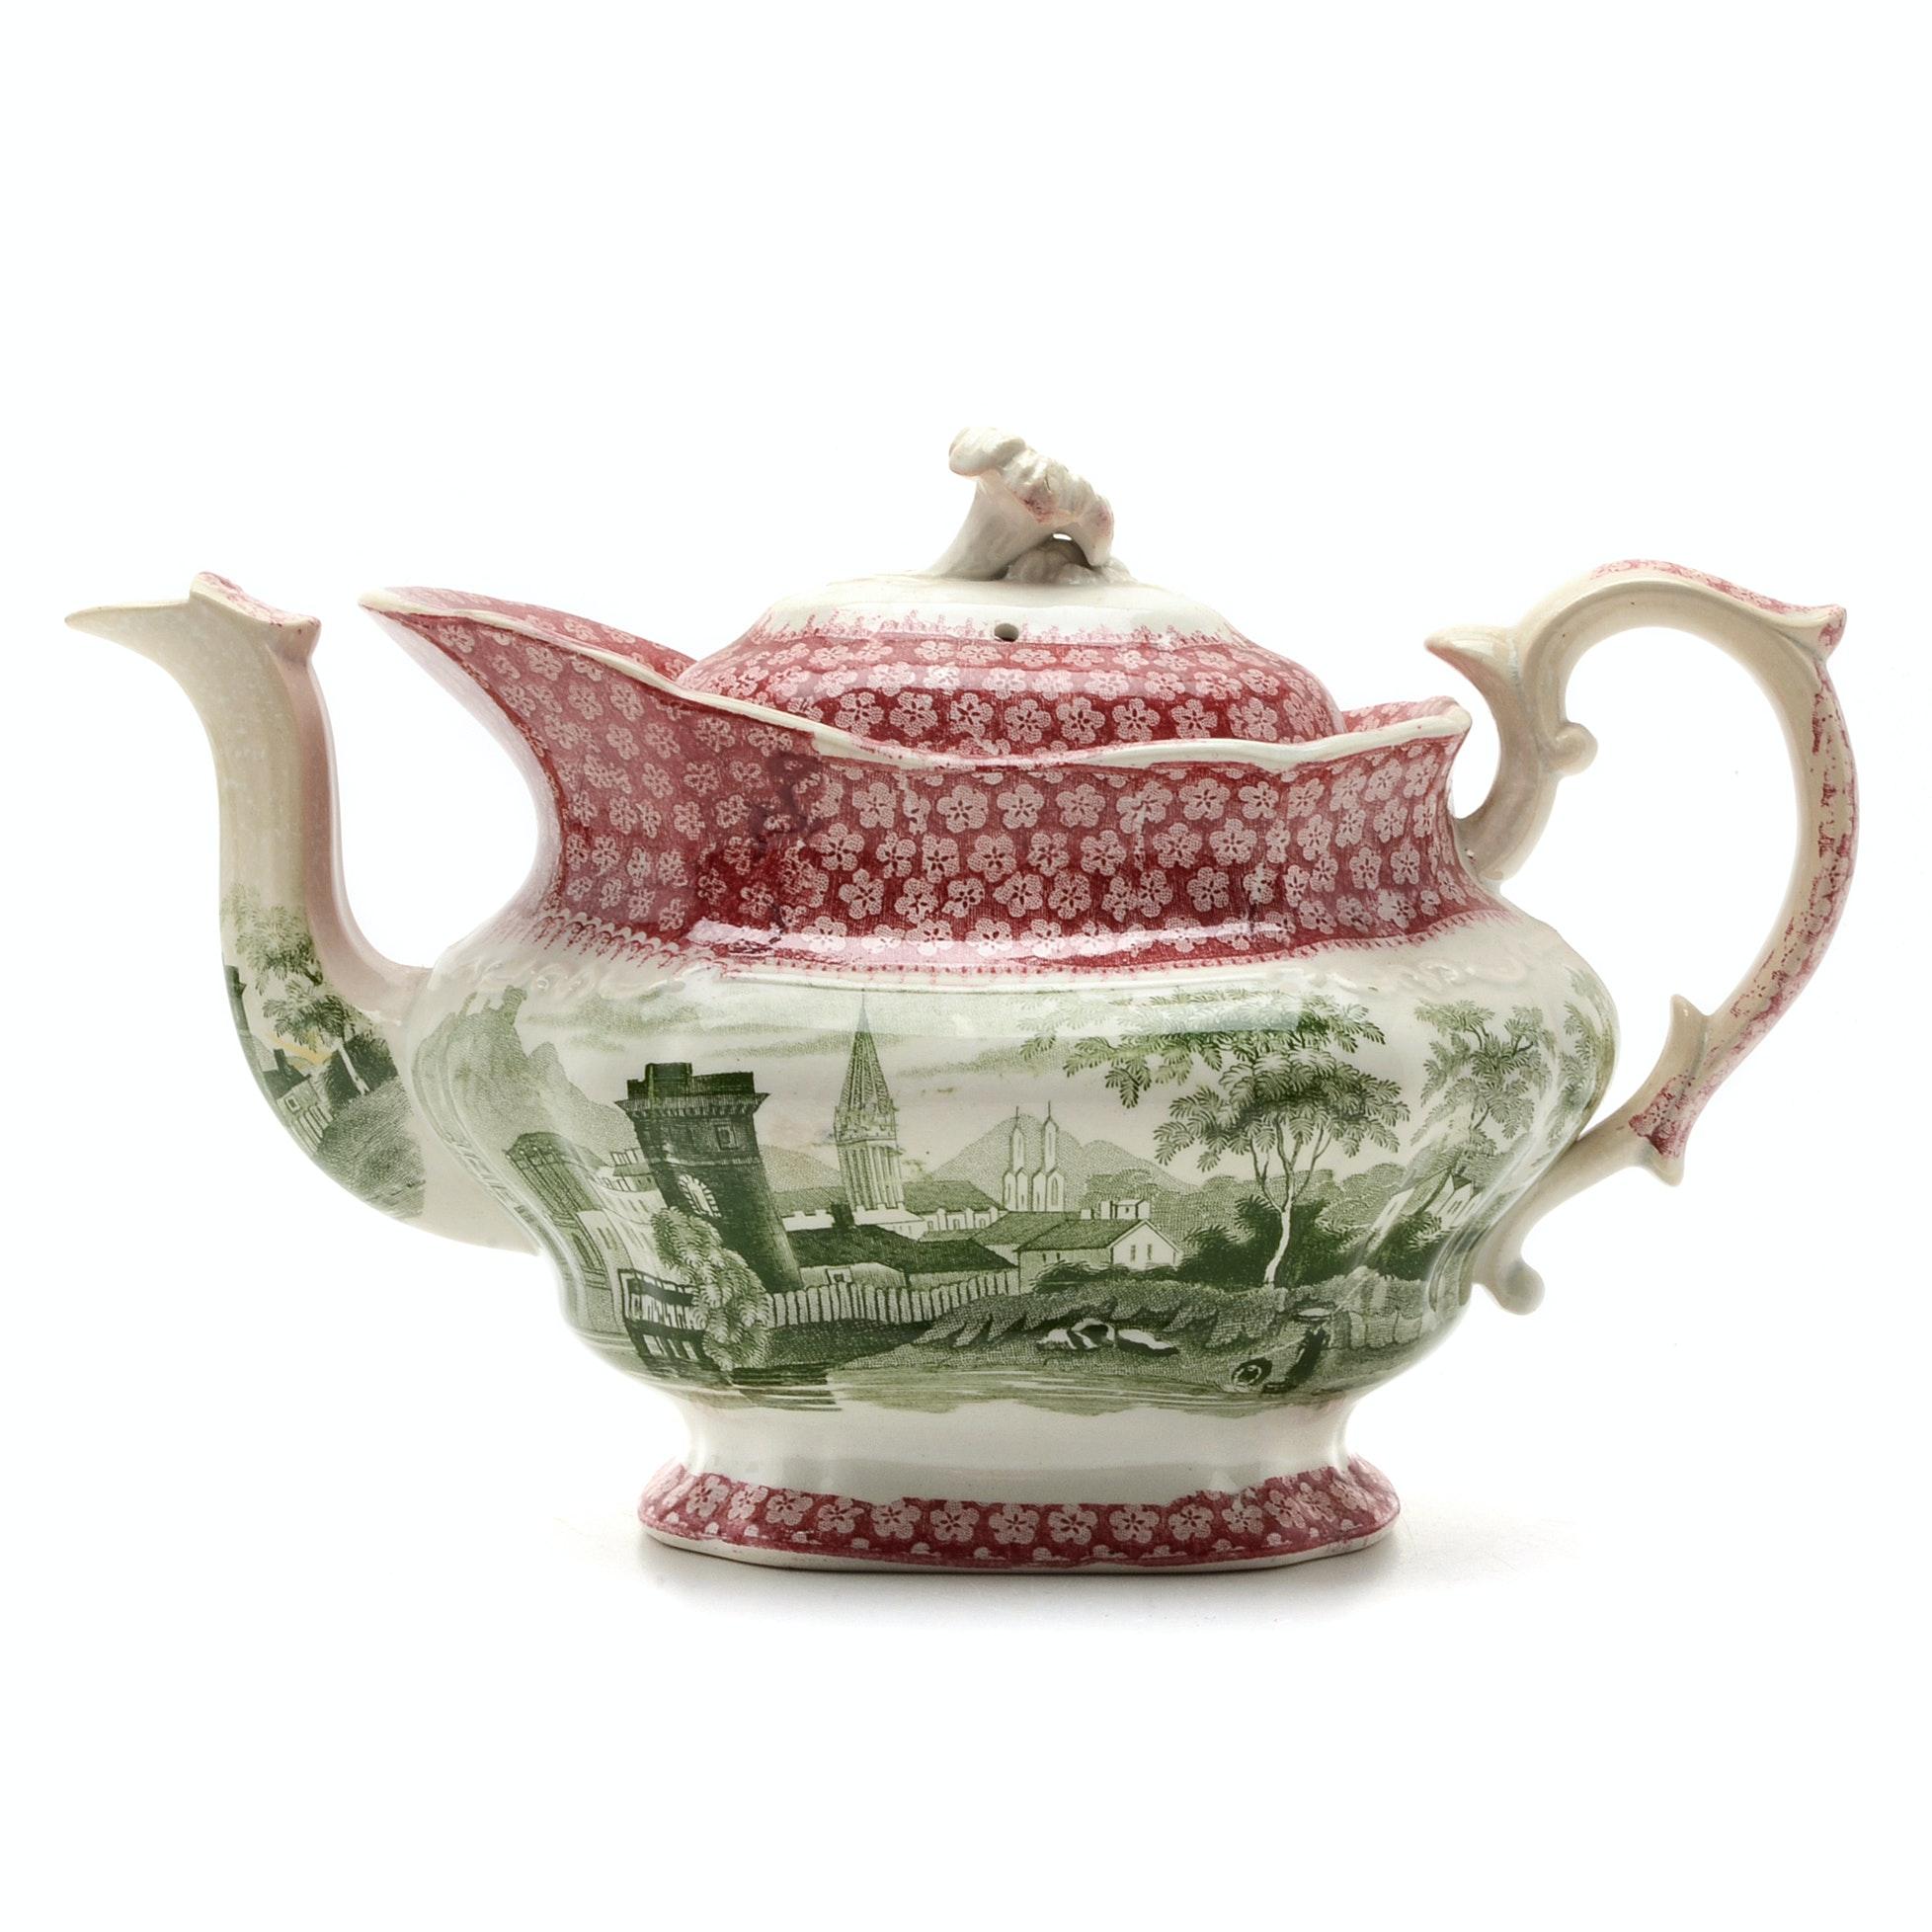 19th Century Staffordshire Bi-Color Transferware Teapot